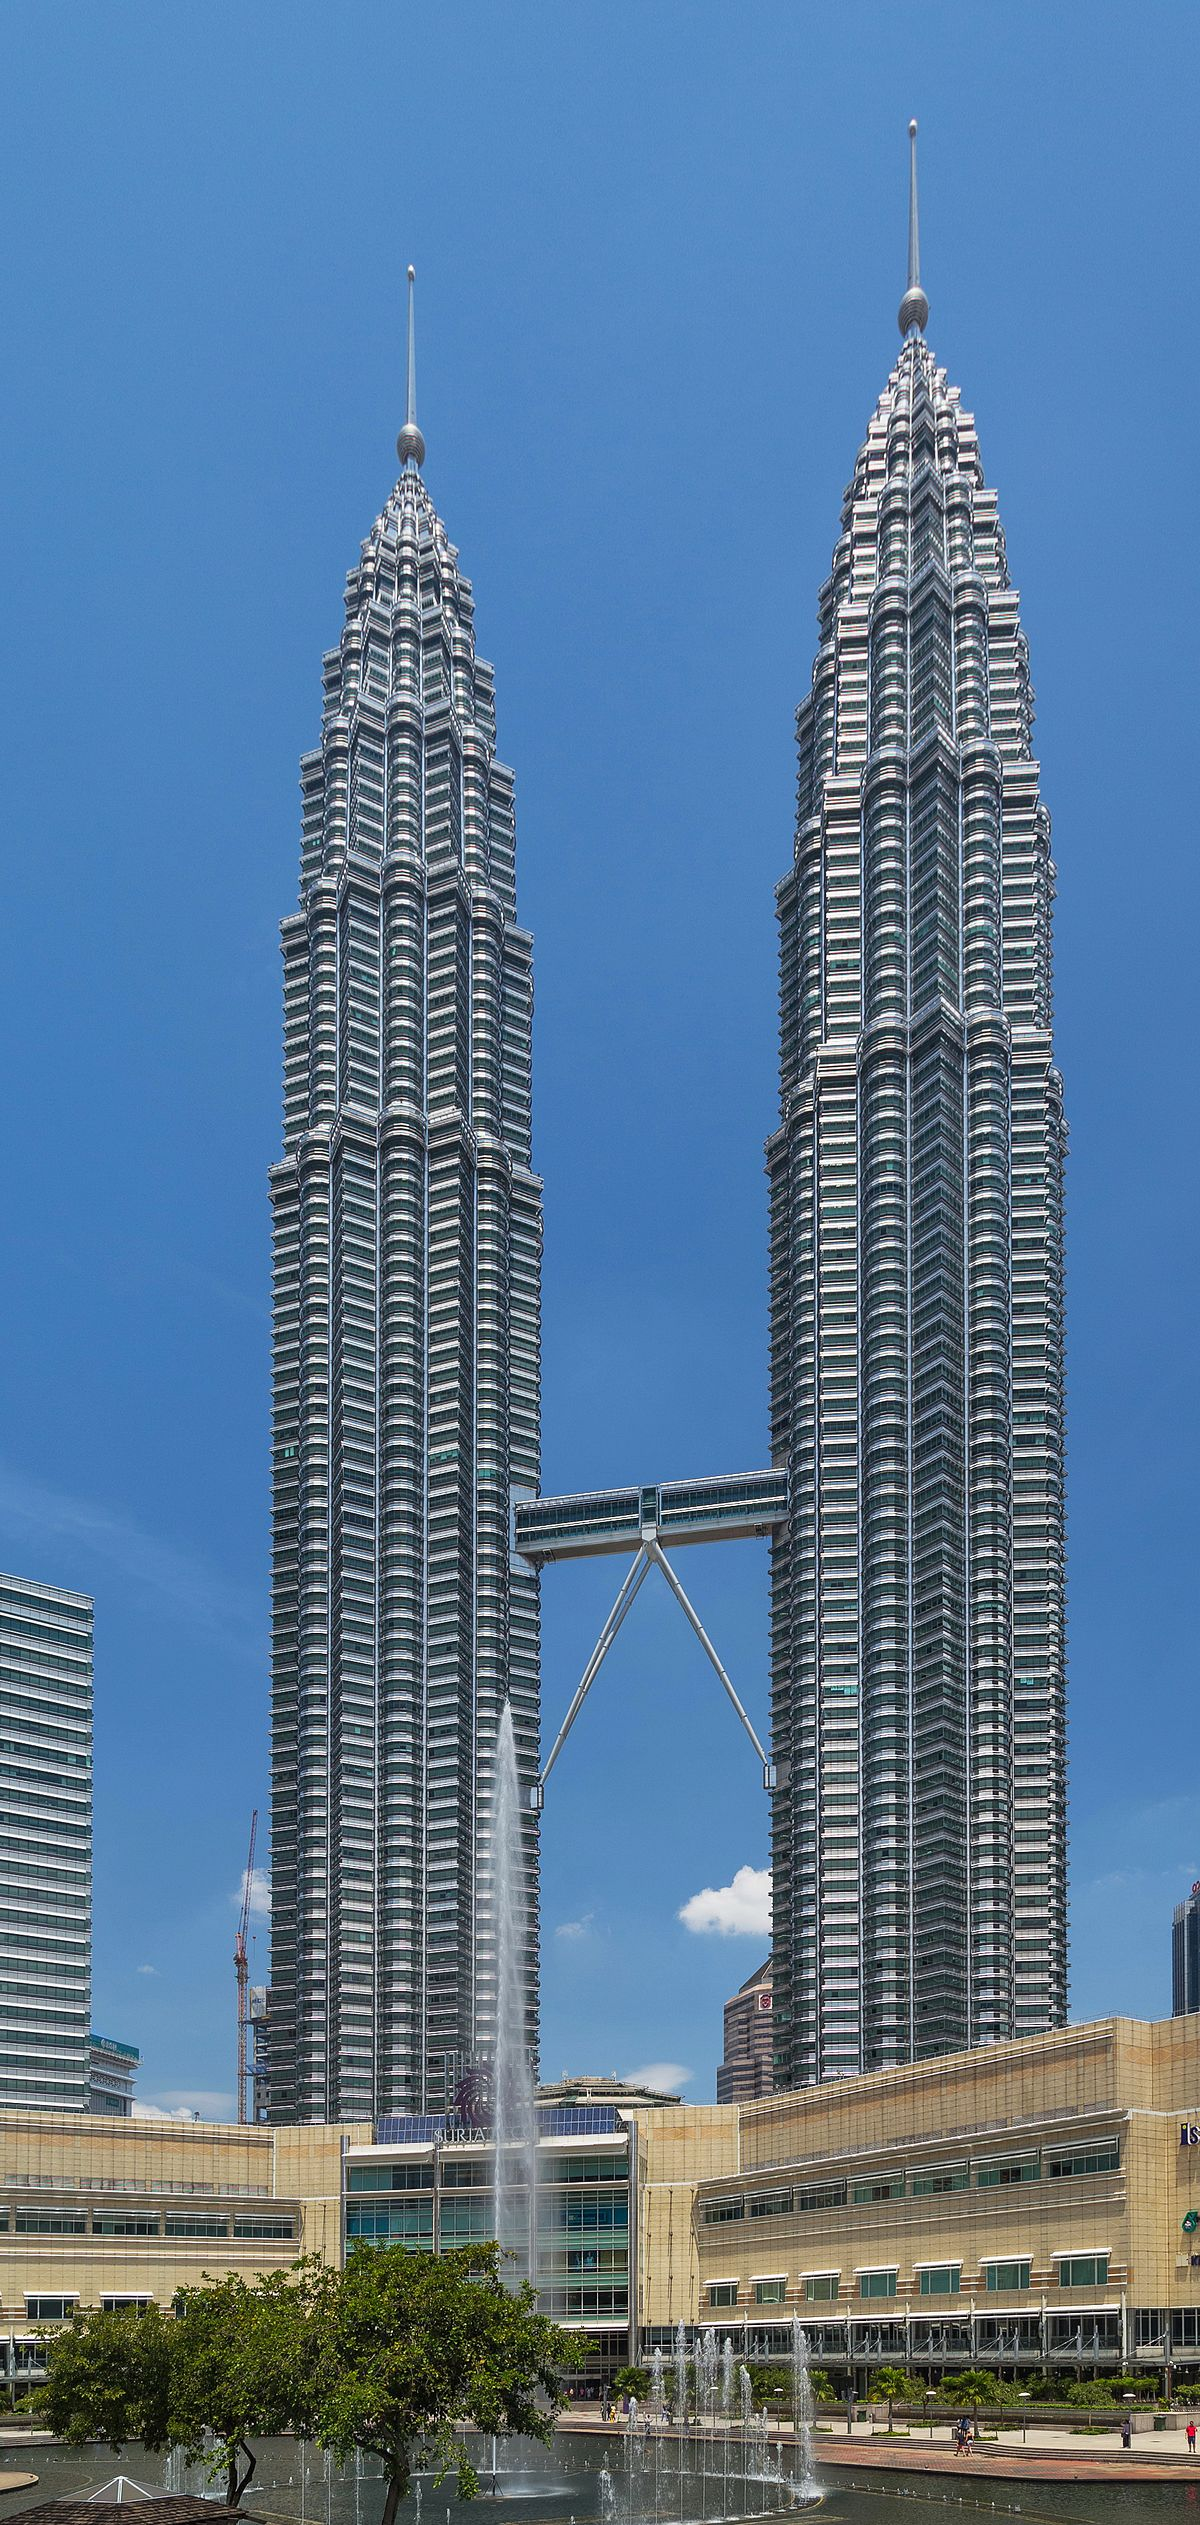 petronas twin towers - photo #39